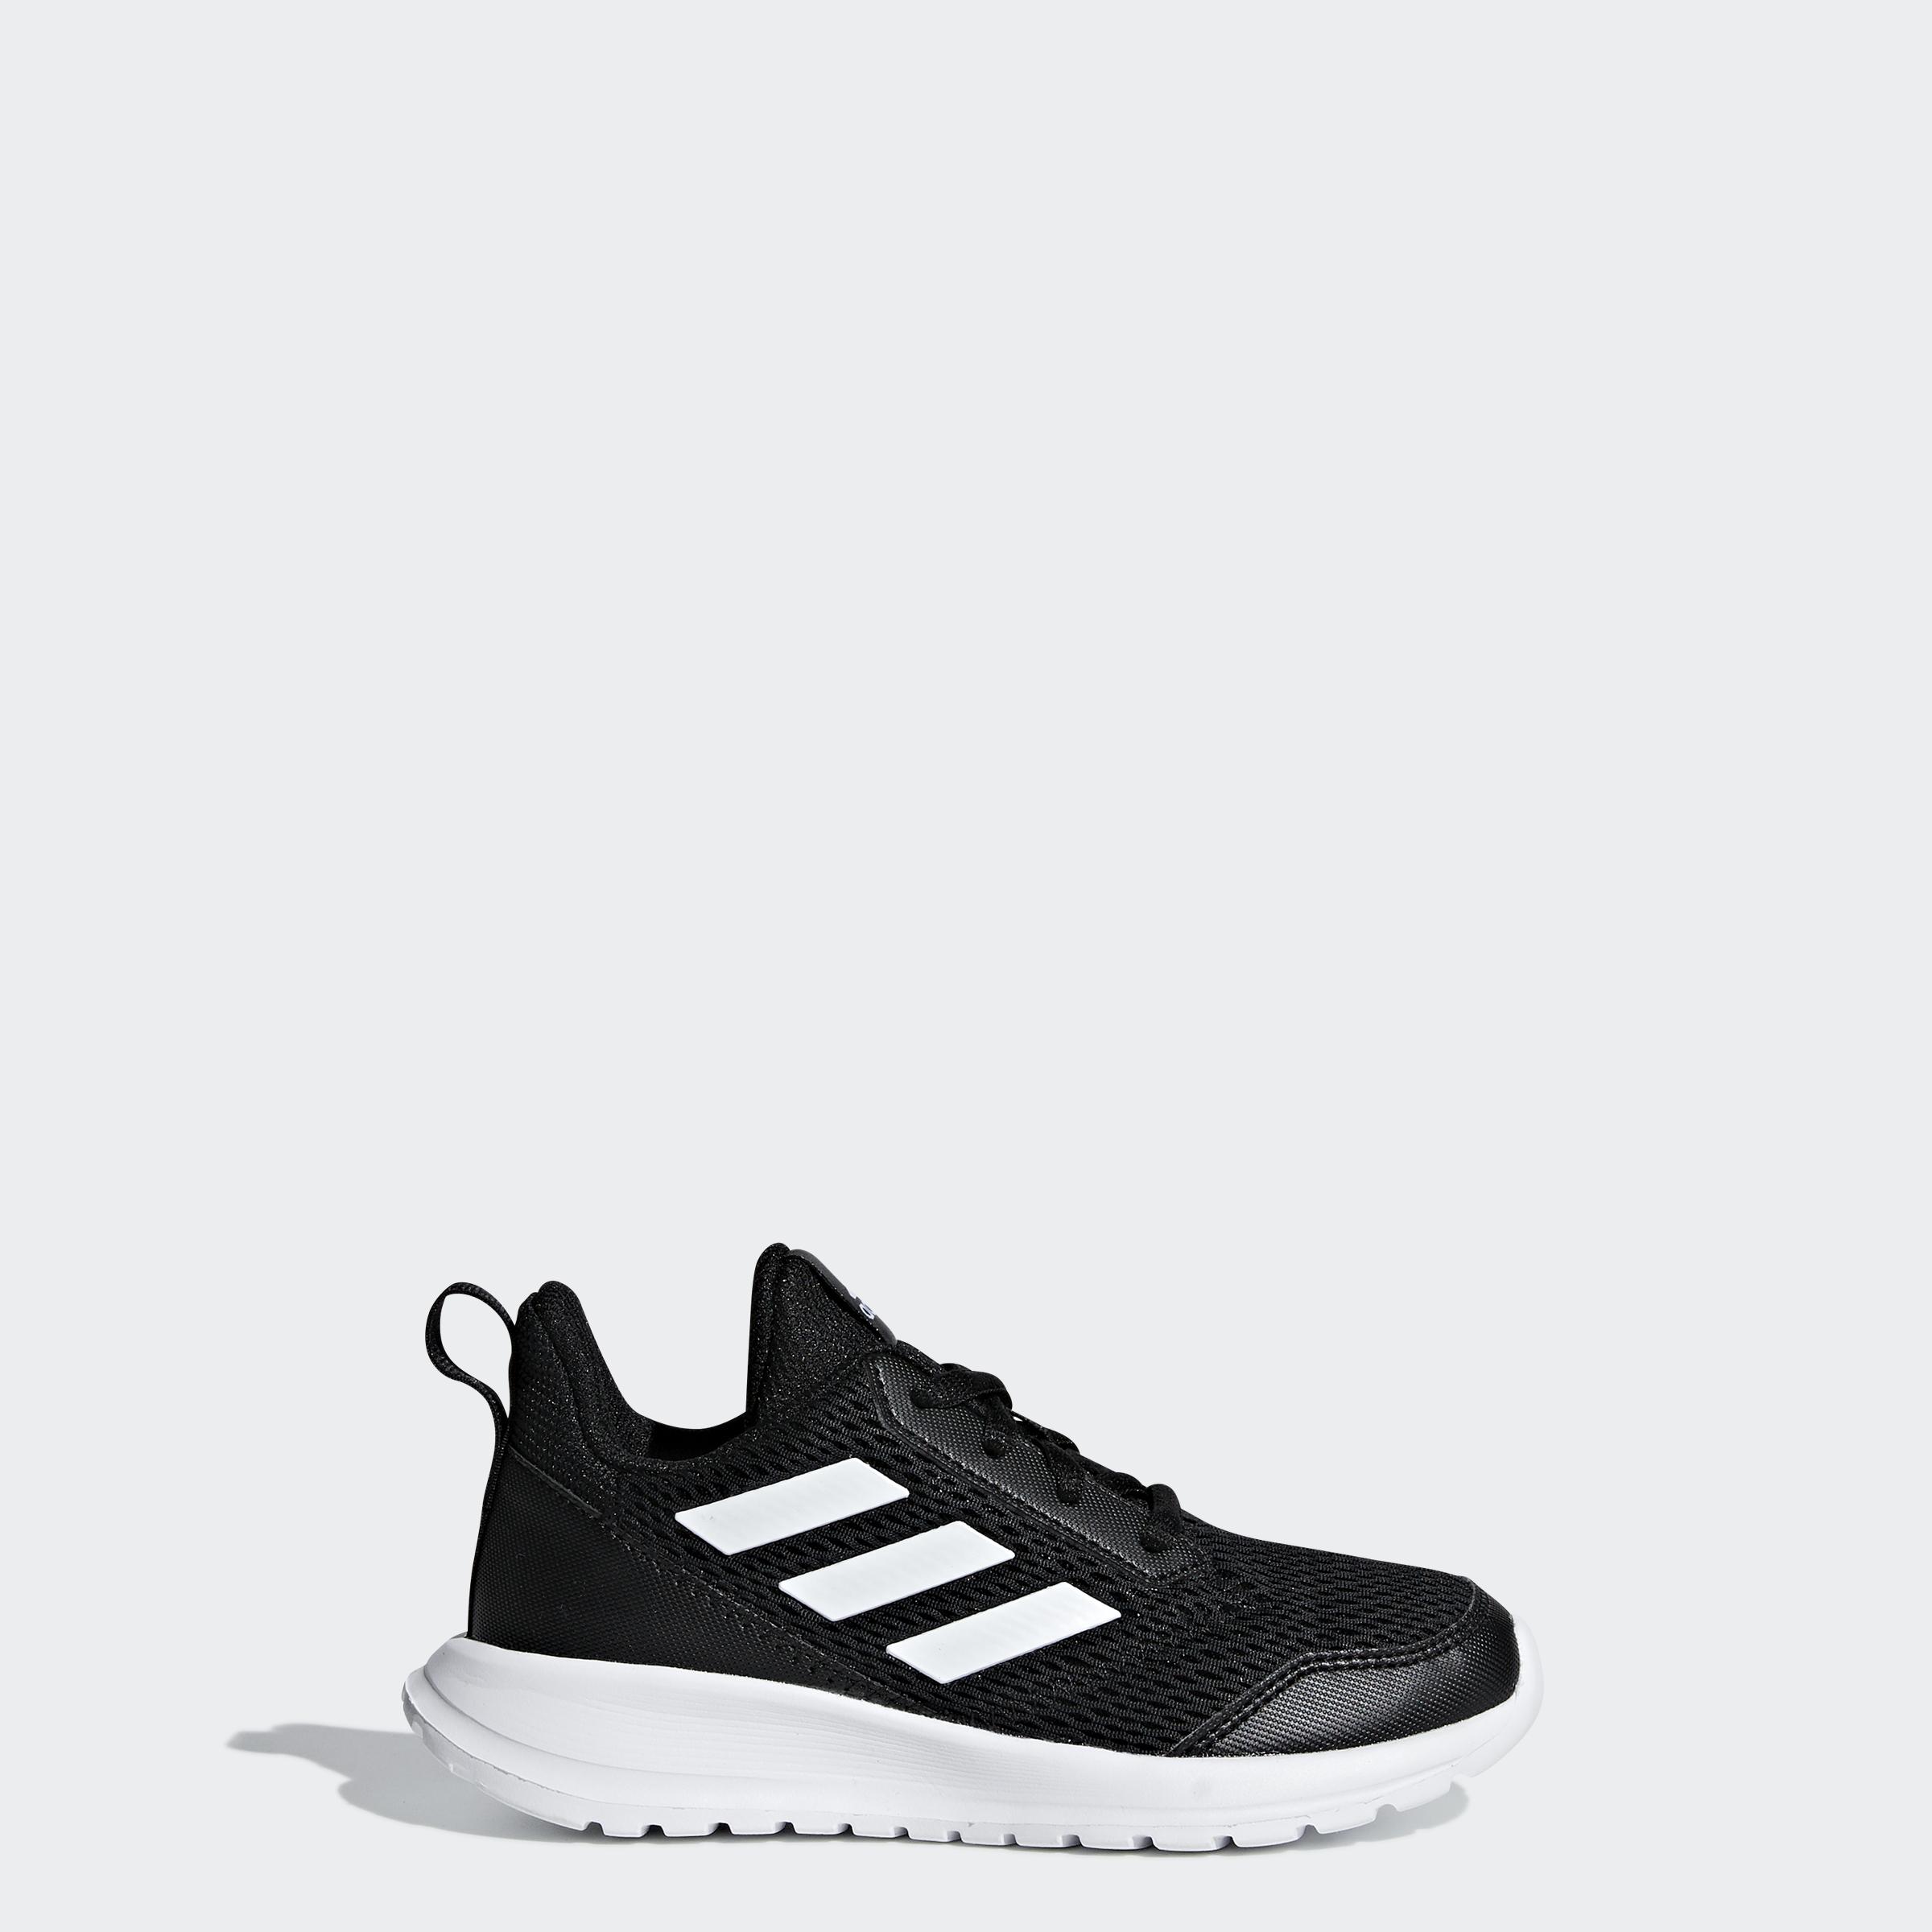 adidas-AltaRun-Shoes-Kids-039 thumbnail 19